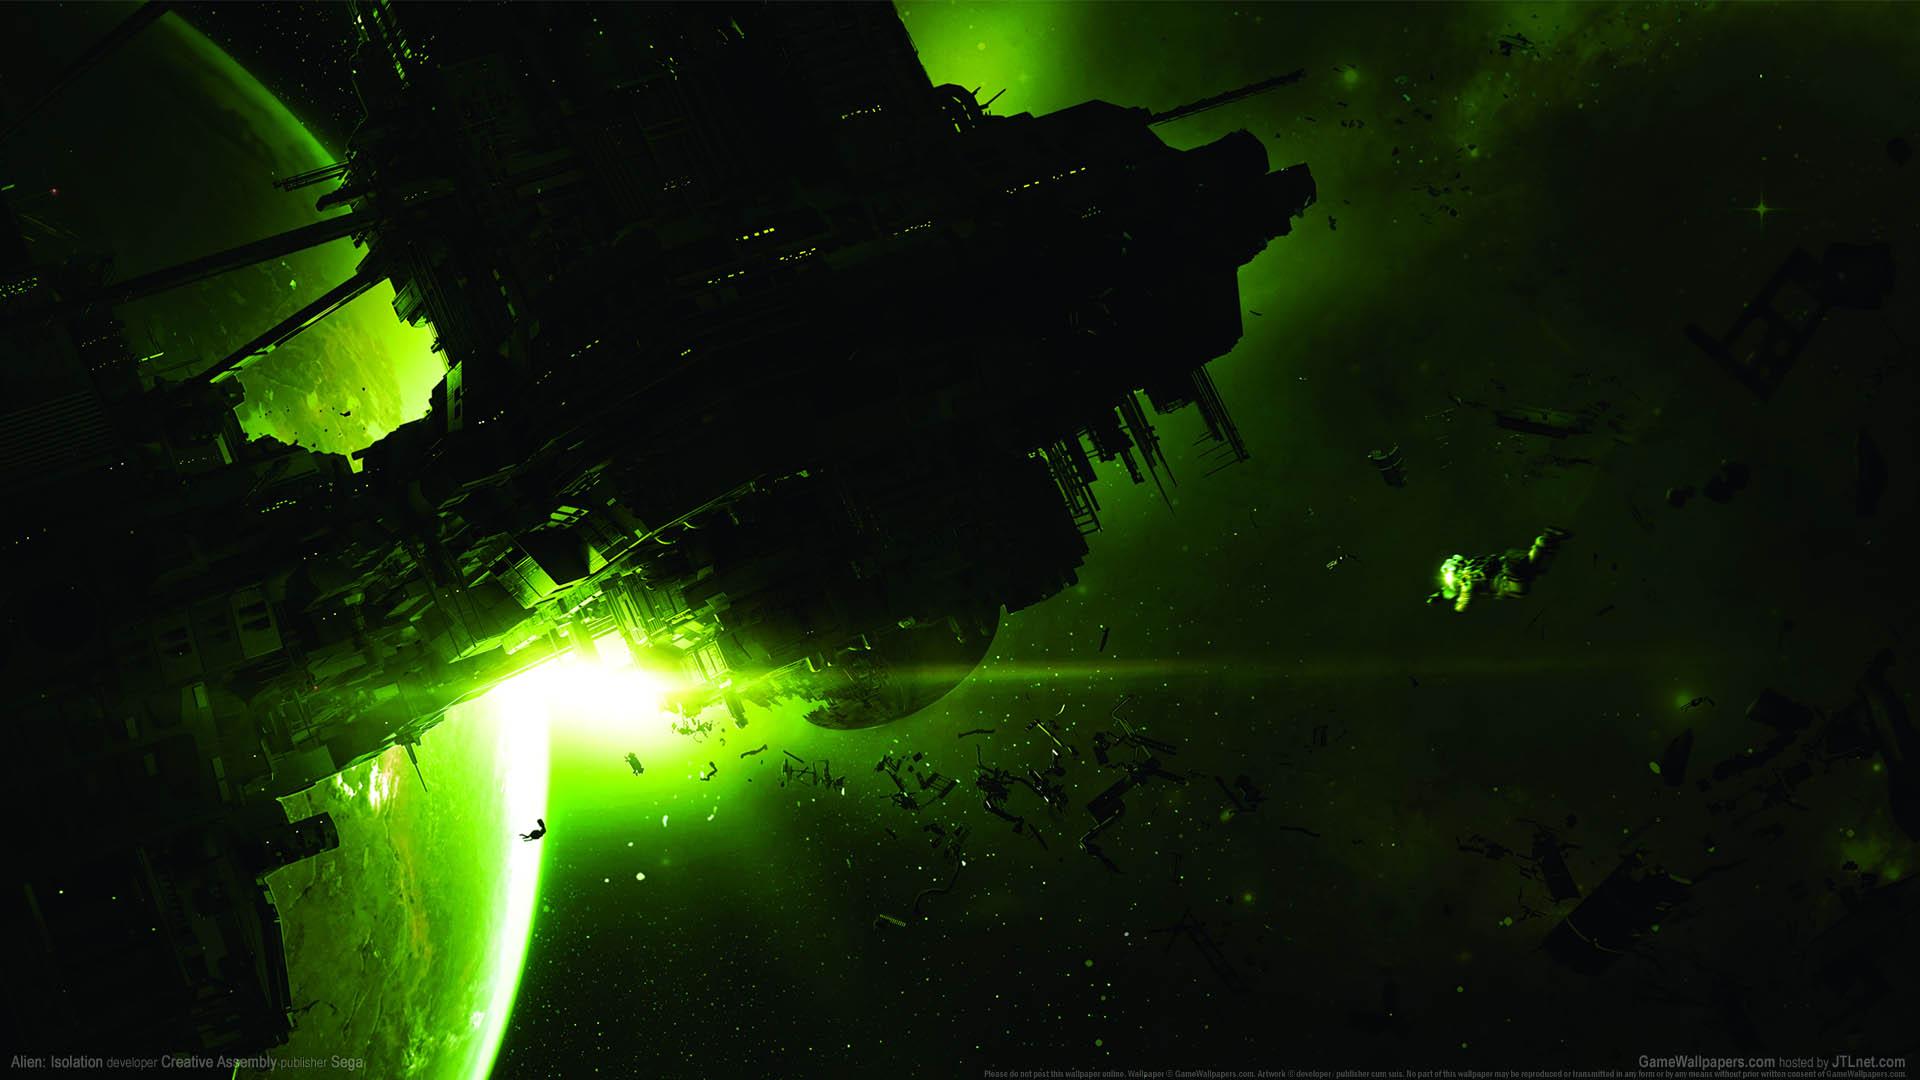 Alien: Isolation wallpaper 01 1920x1080